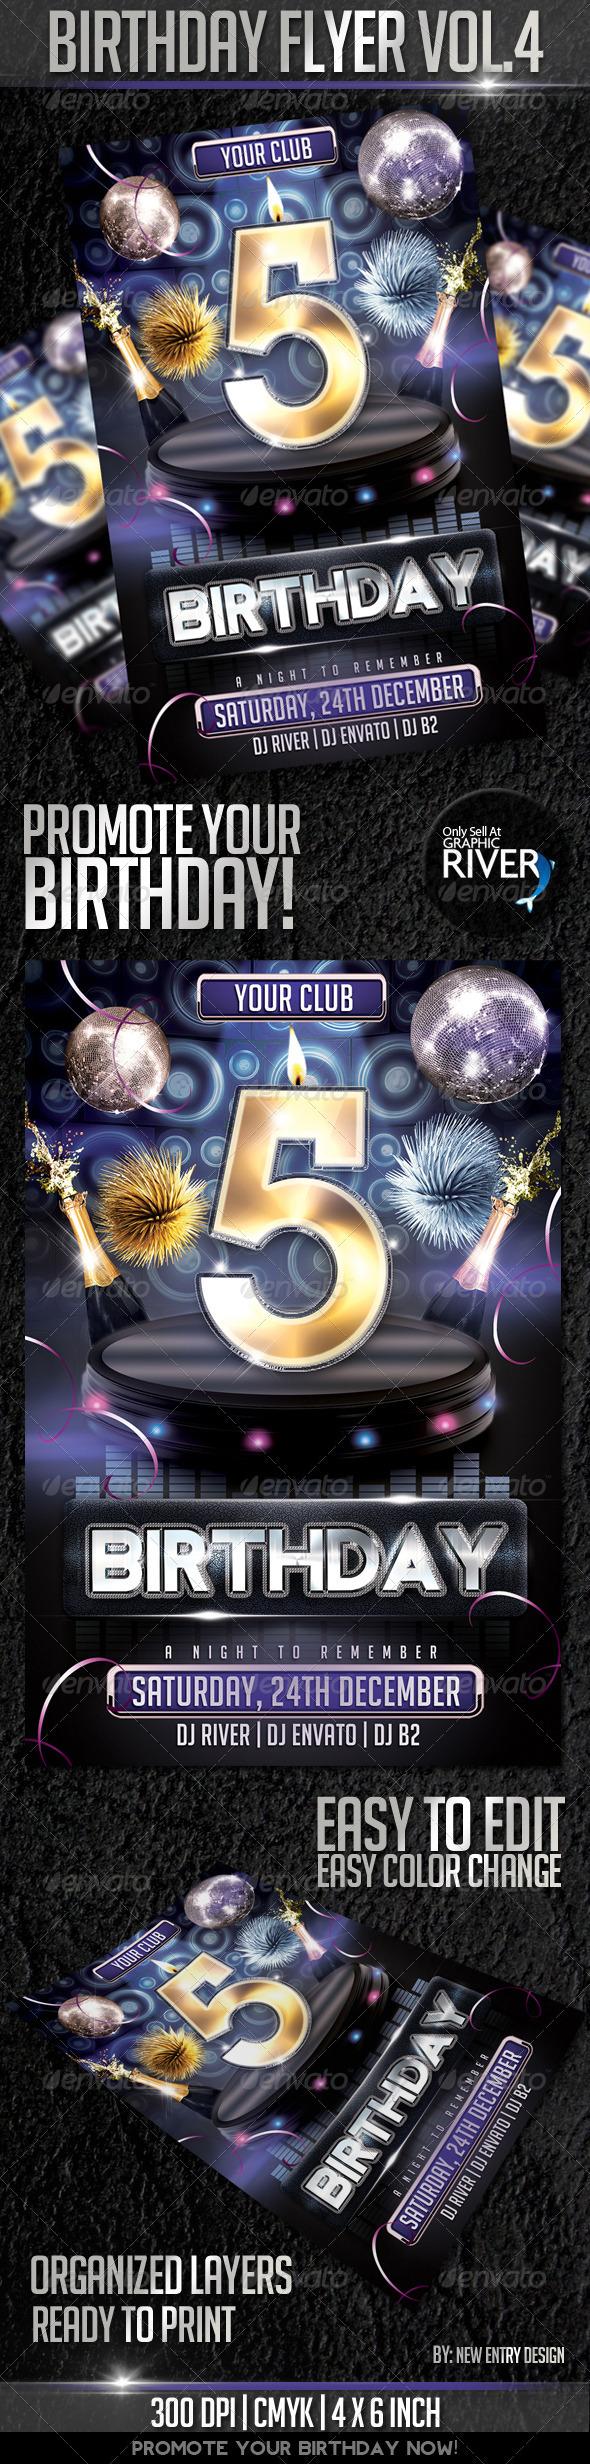 Birthday Flyer Template Vol4 - Flyers Print Templates